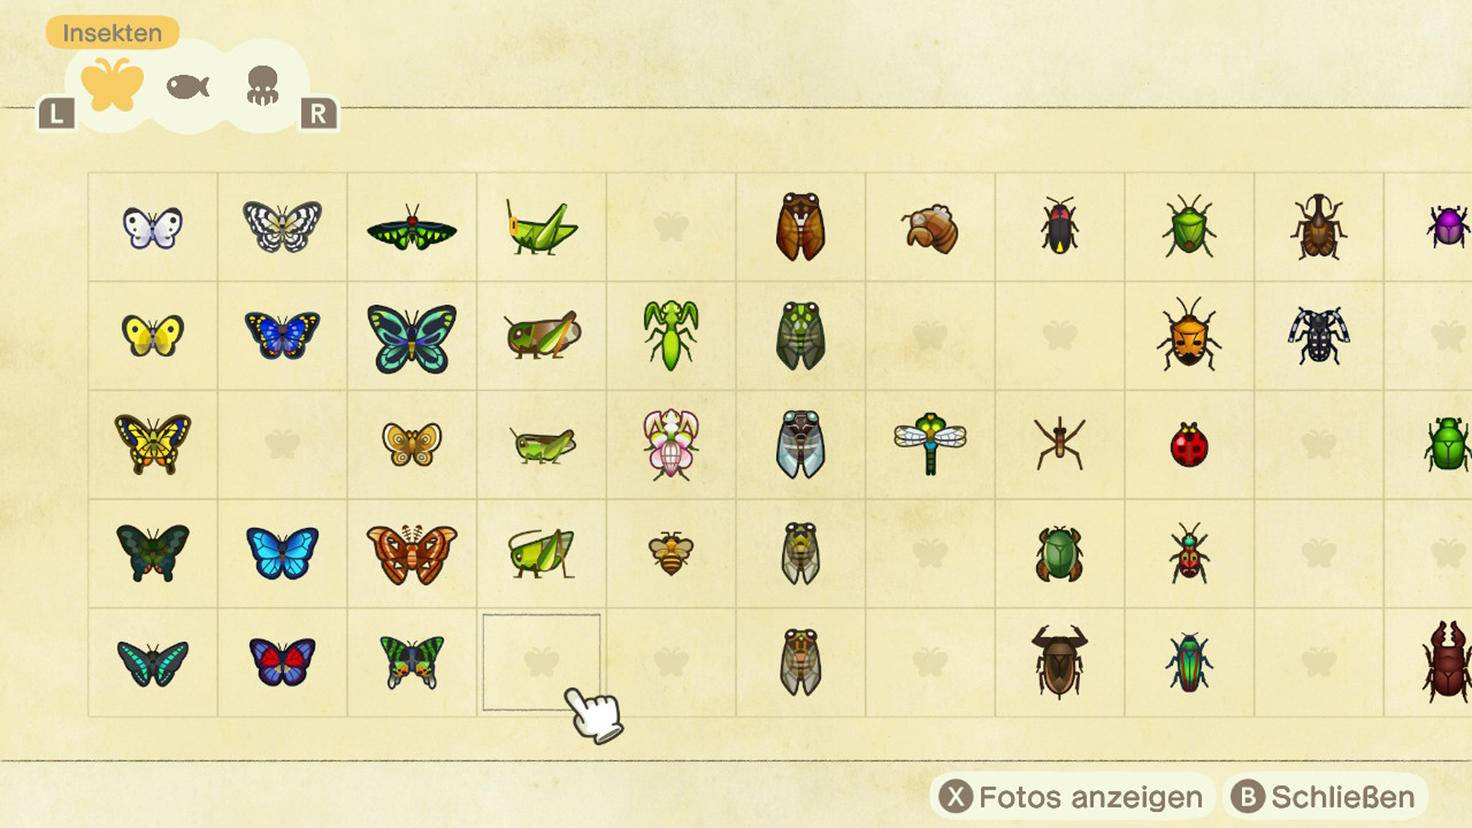 Animal Crossing New Horizons Faunapädie 1